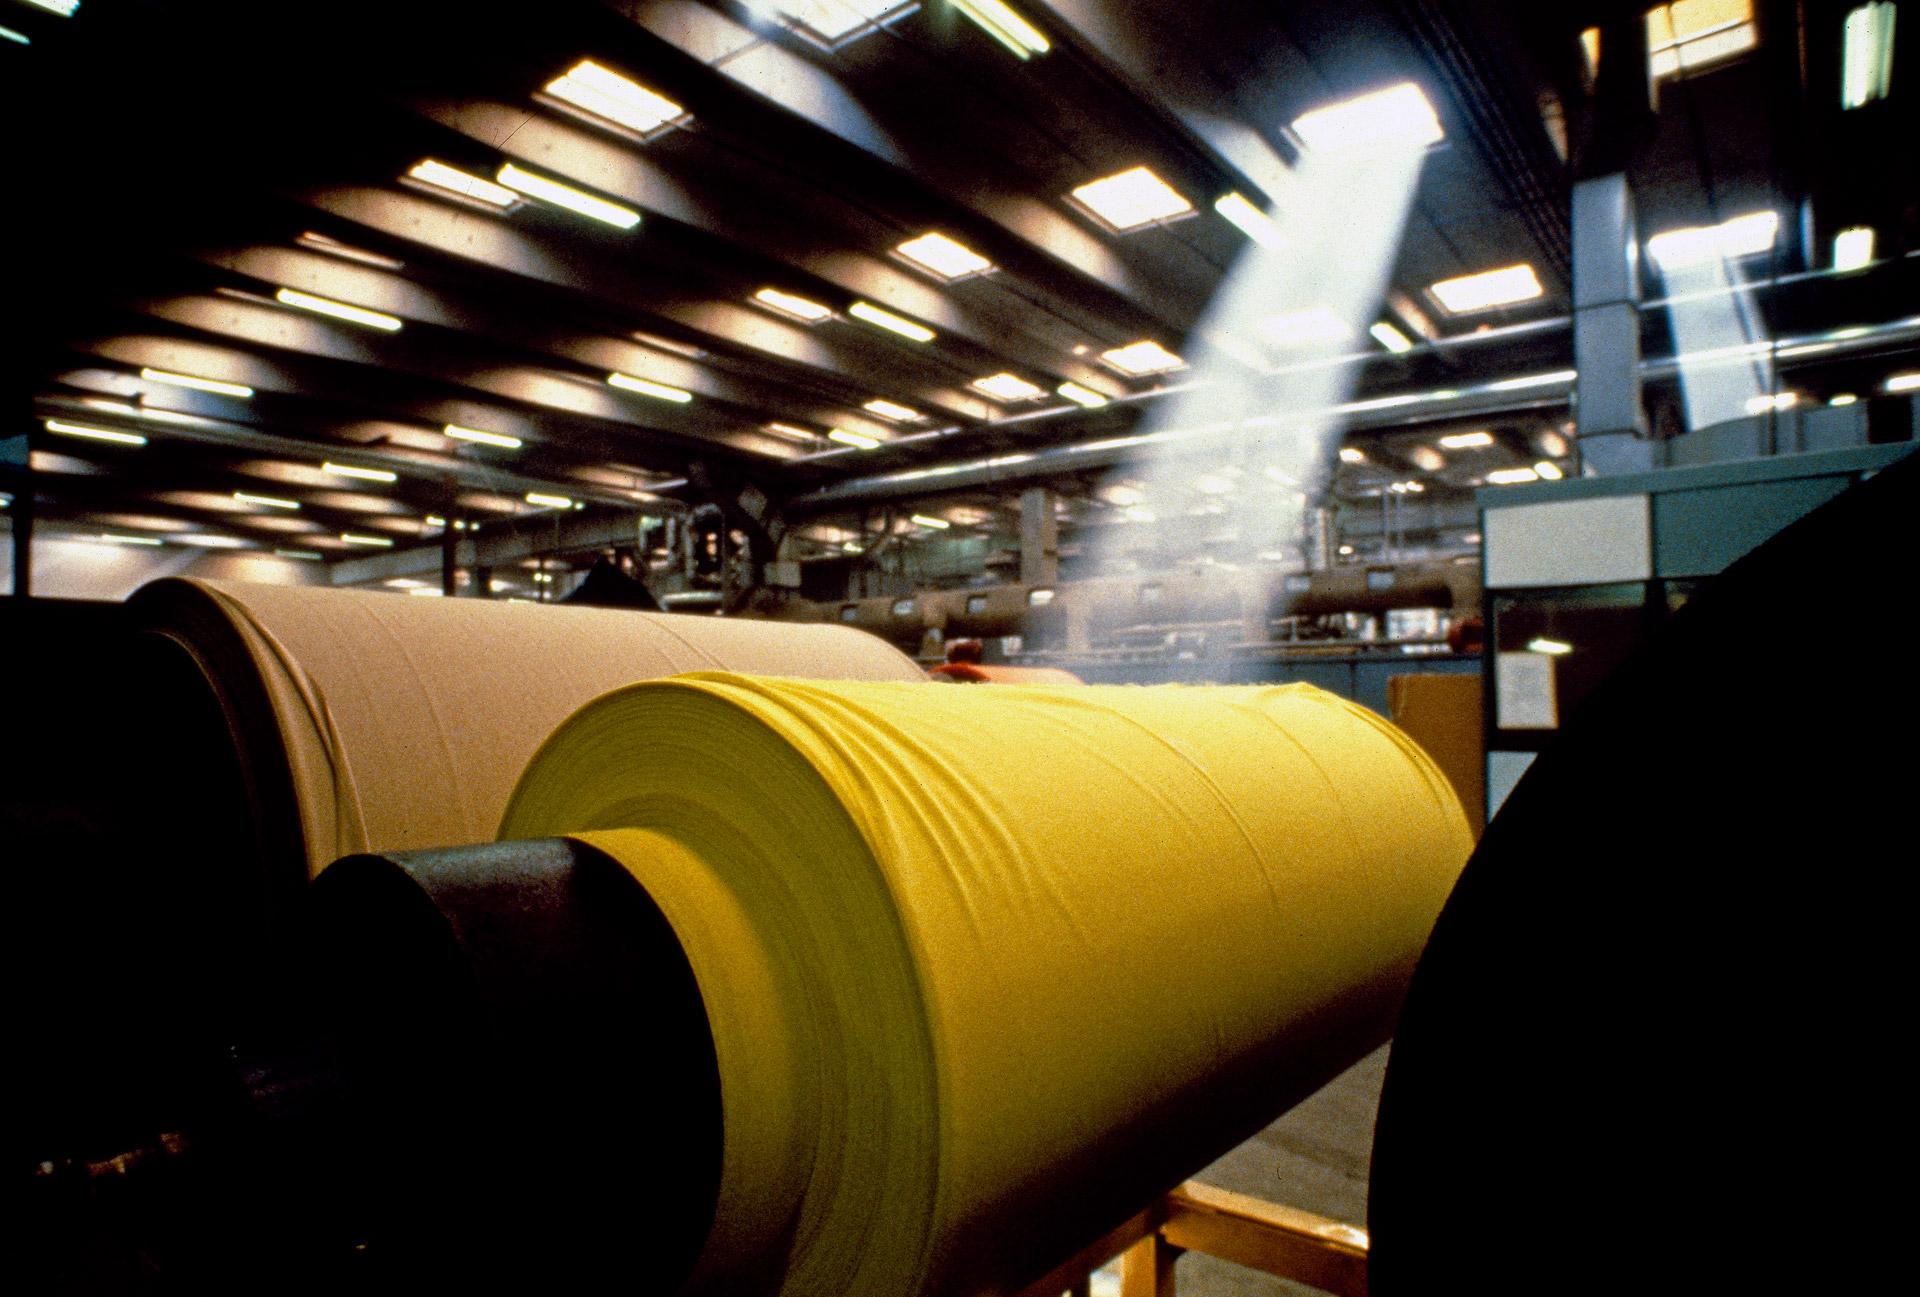 Big rolls of material at B.W. Wernerfelt factory